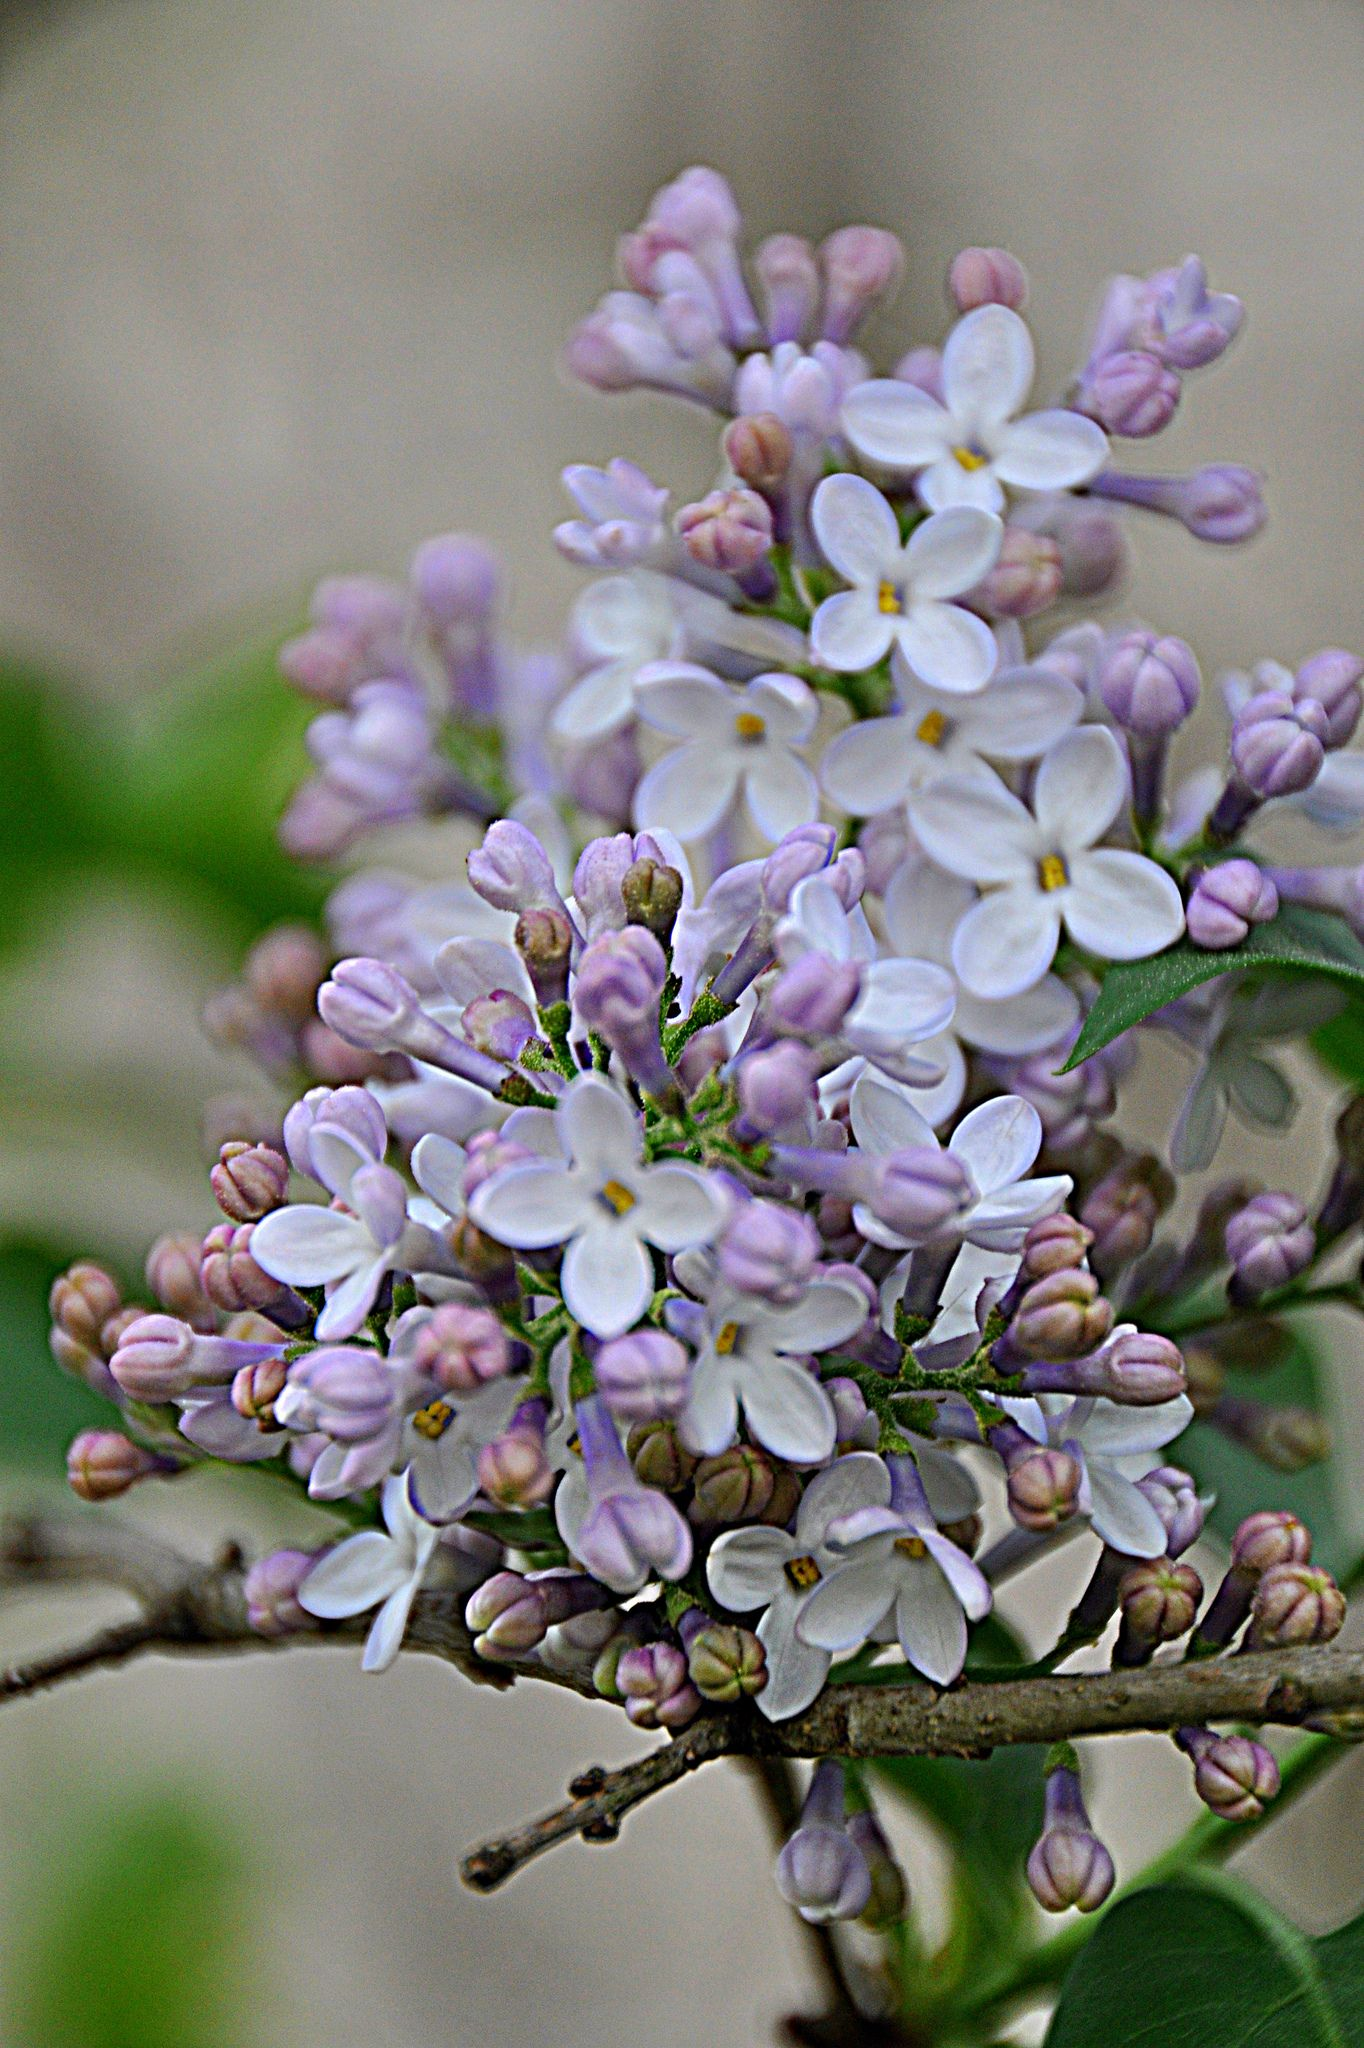 Dsc 0852a Lilac Flowers Lilac Lilac Gardening